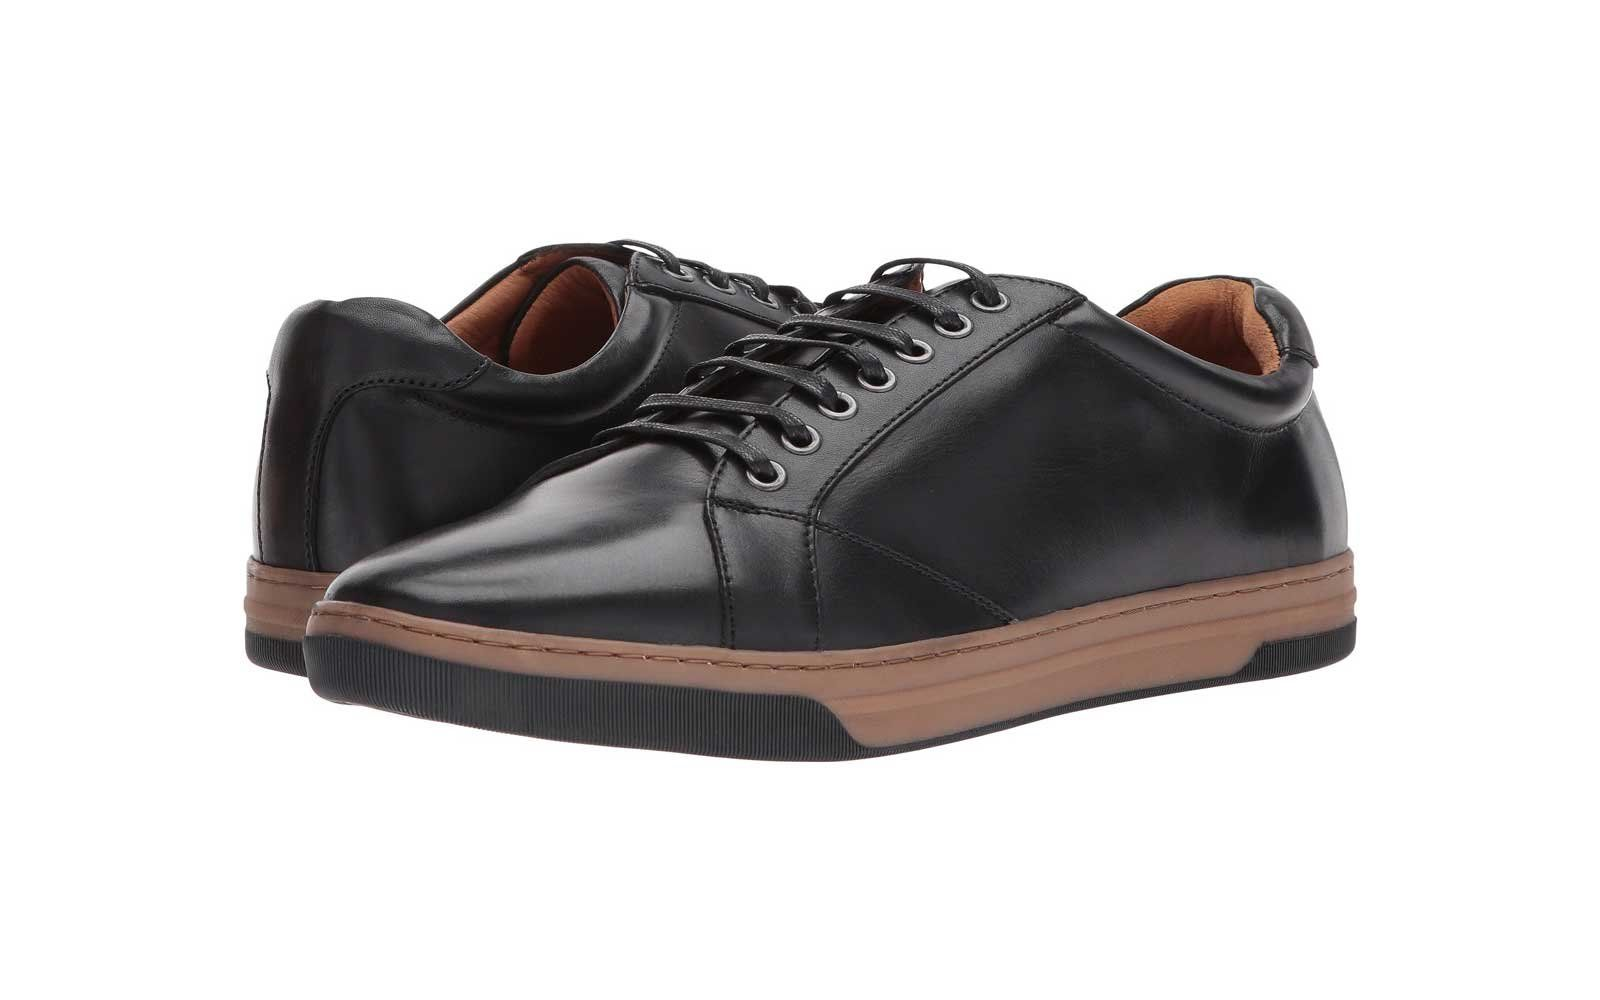 The Best Men S Dress Sneakers Tennis Shoes Dress With Sneakers Mens Dress Sneakers Tennis Shoes Sneakers [ 1000 x 1600 Pixel ]